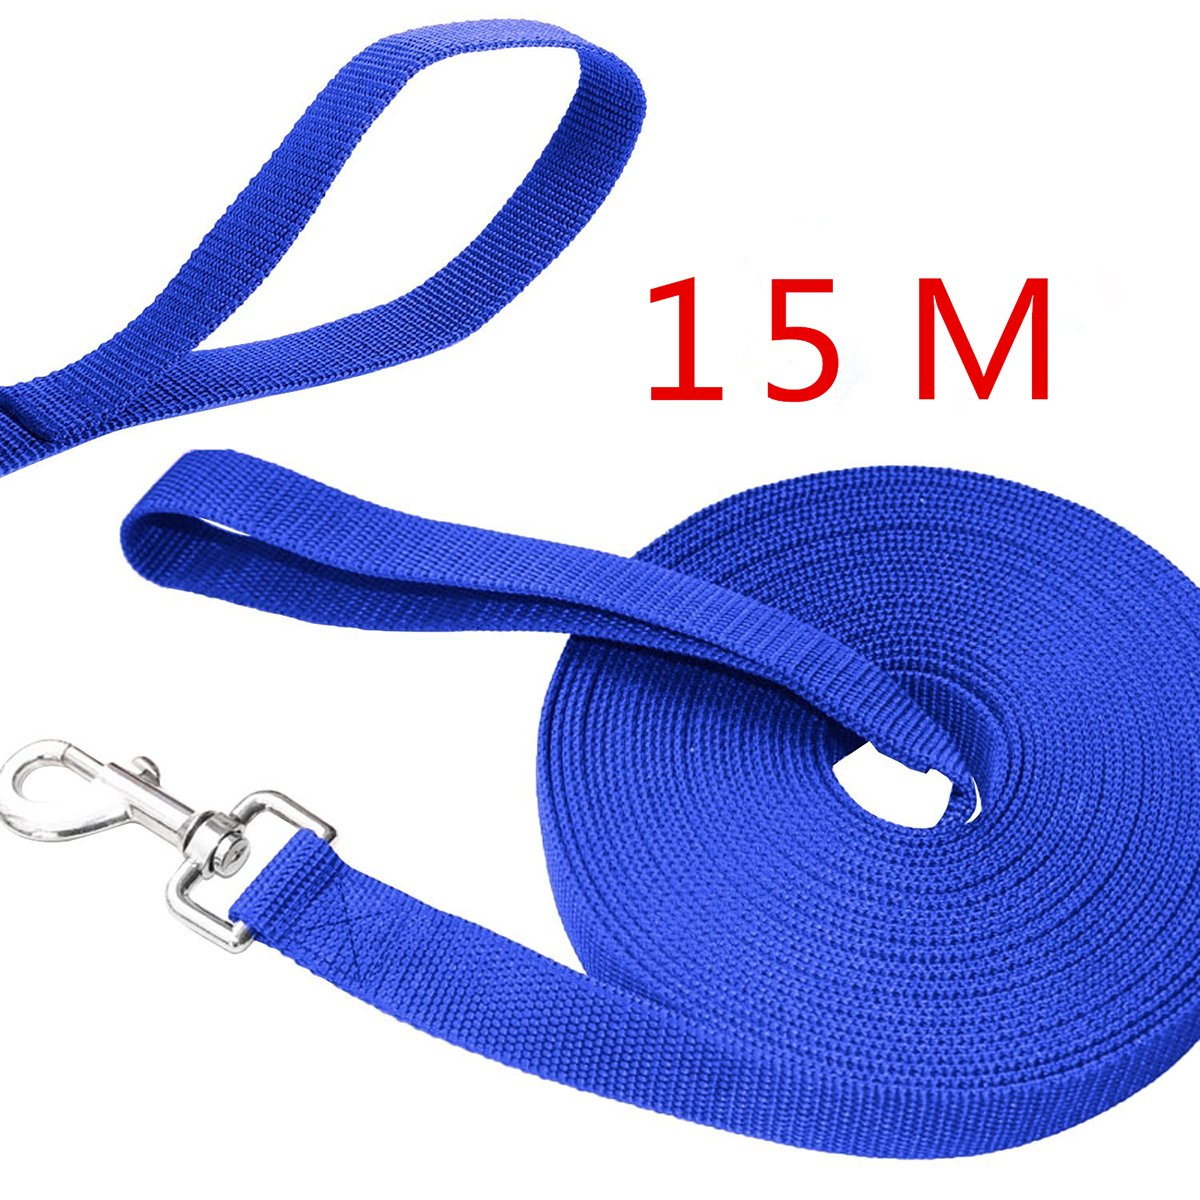 UEETEK 49 Feet Dog Obedience Leash/Training Agility Lead Leash Rope for Training Camping Backyard,(Blue)